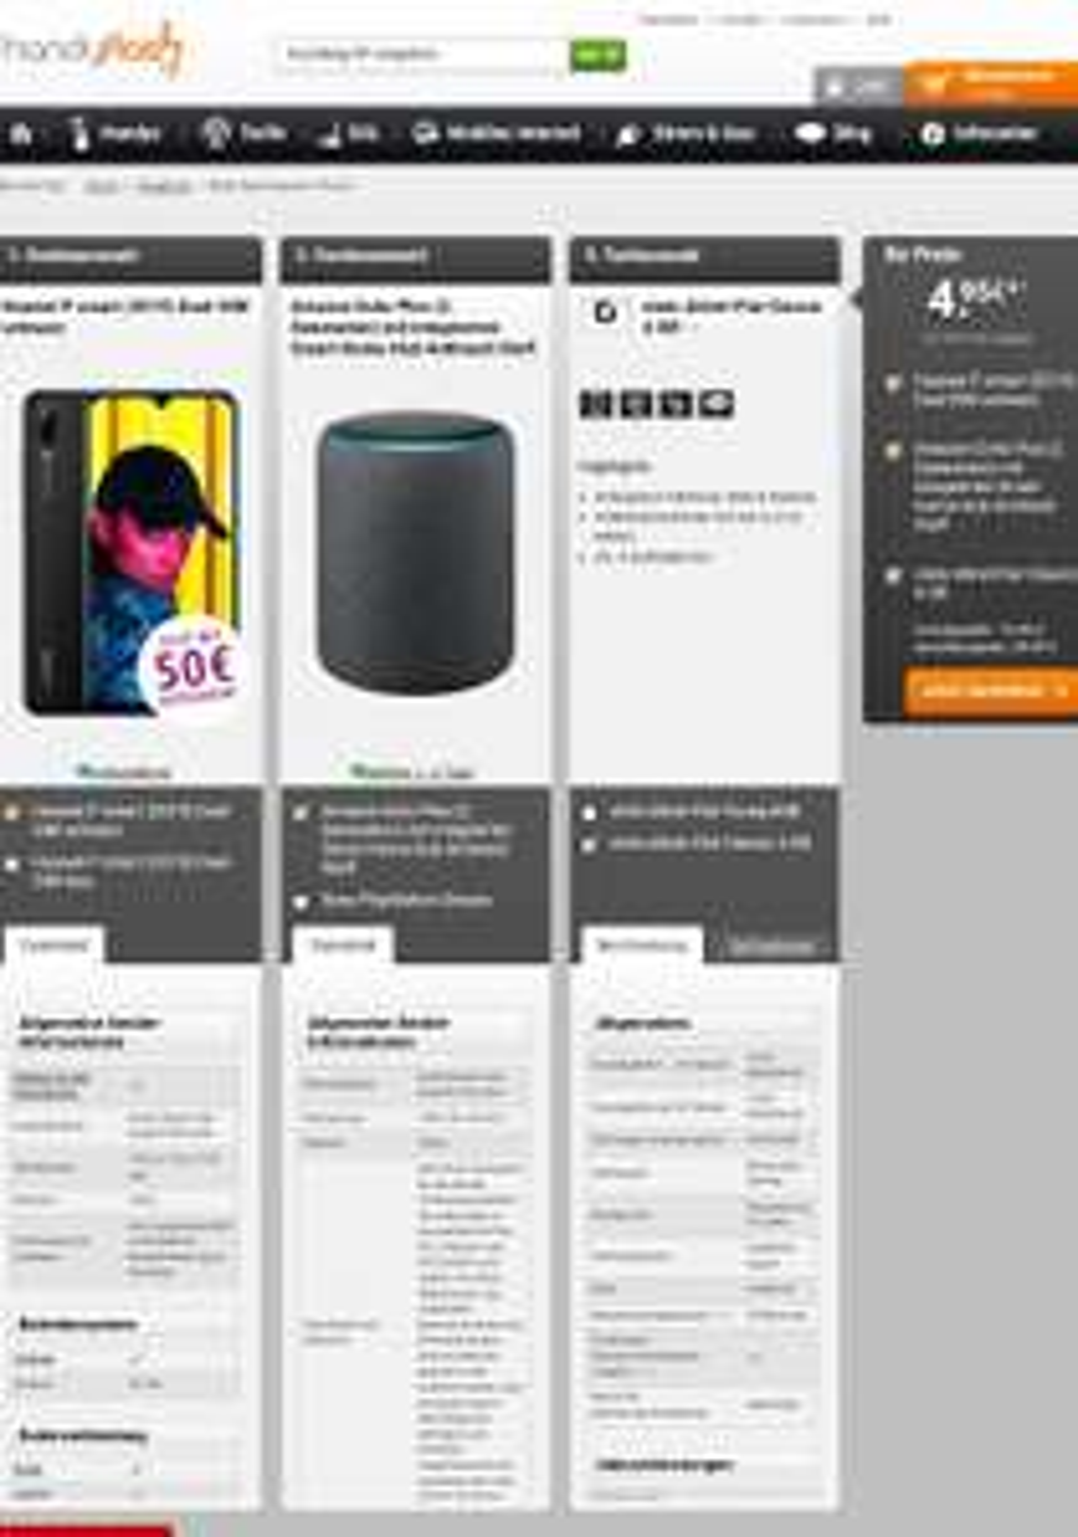 Huawei P Smart 2019 Dual Sim + Amazon Echo Plus(2.Gen. 149,99€) + 50€ Gutschein  eff. 1,49 €/Monat + Otelo AllNet Classic 4 GB  Vodafone